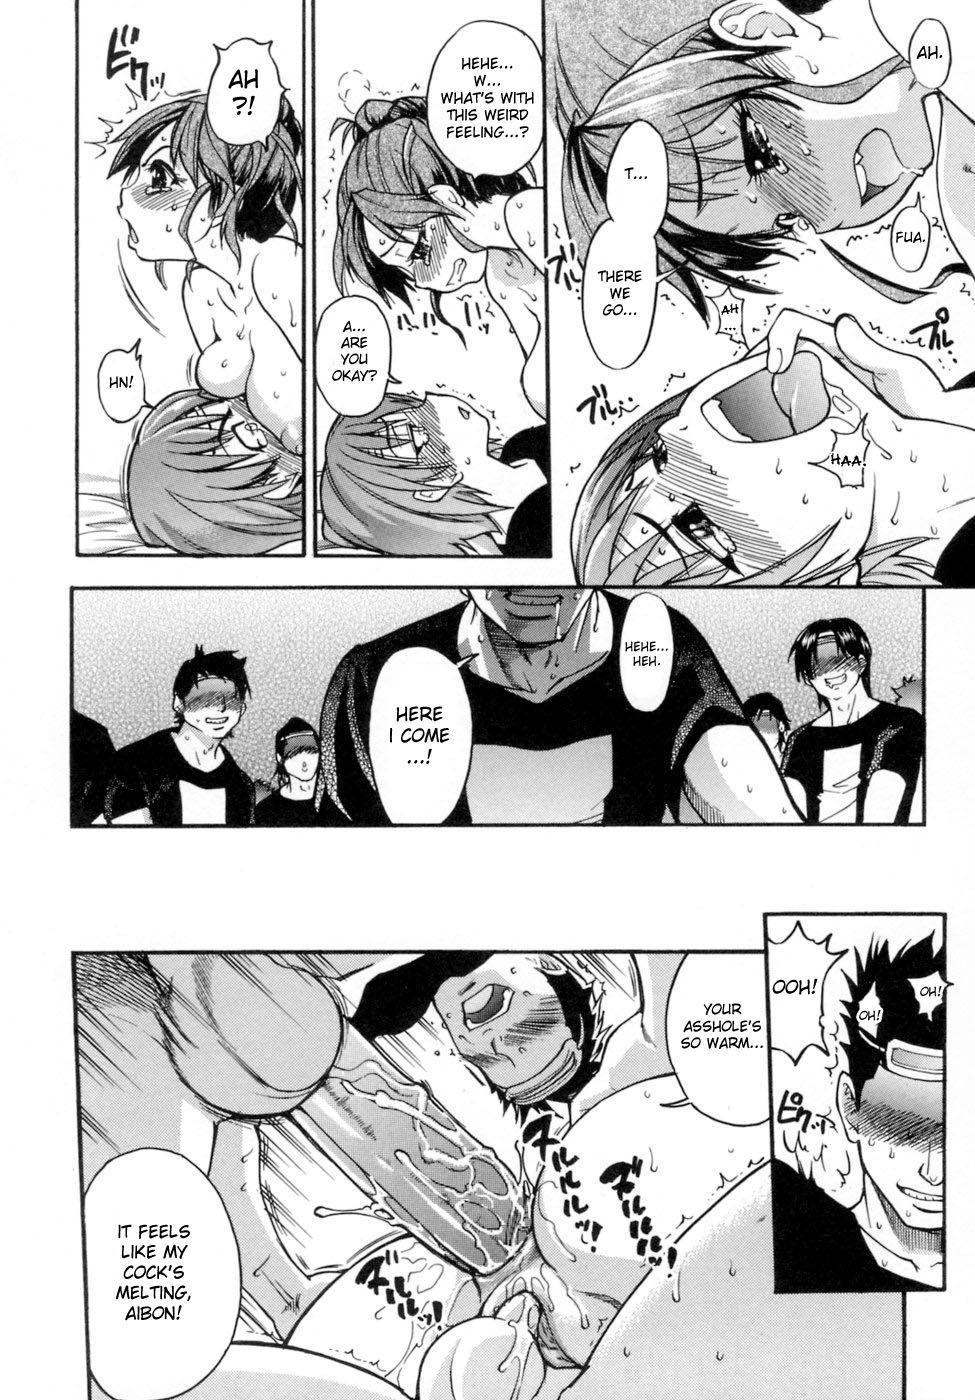 Shining Musume. 5. Five Sense of Love 180